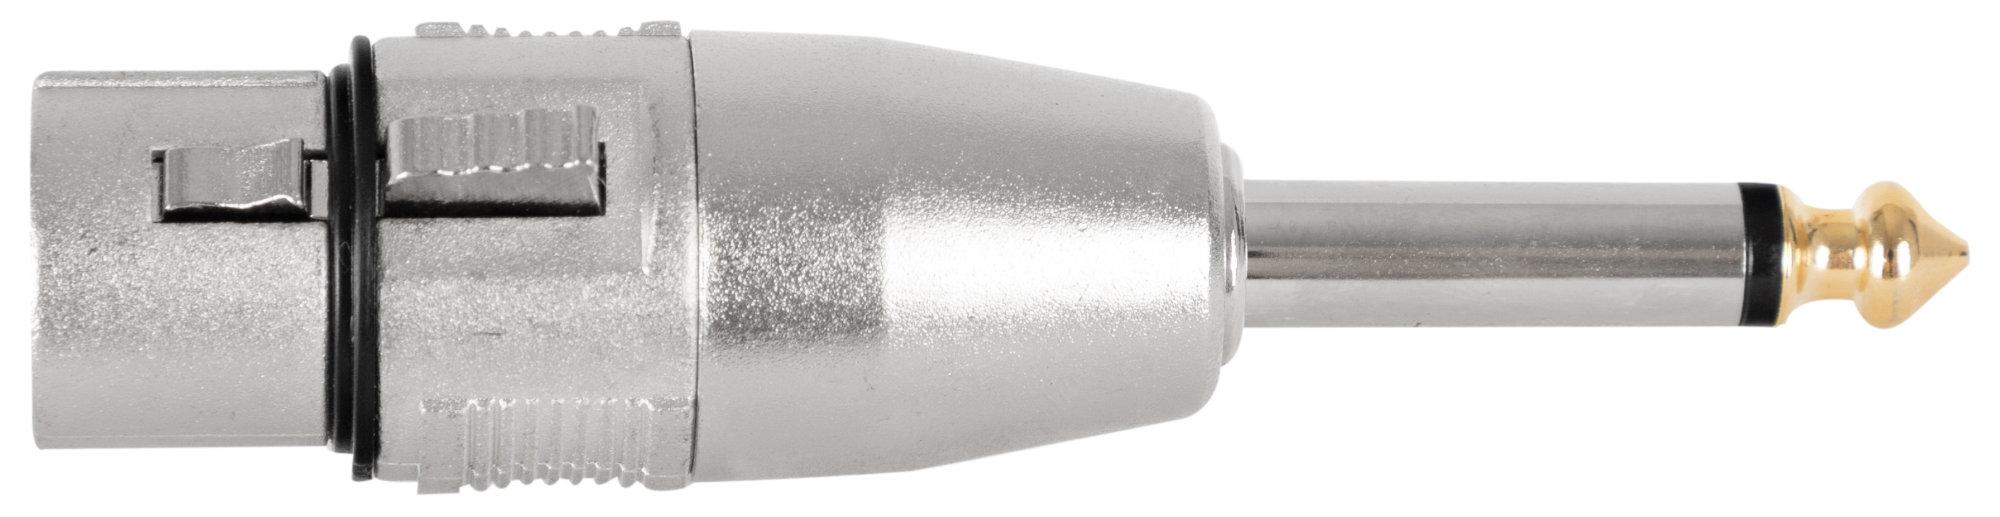 Kabelmulticores - Pronomic AD JMXF Adapter 6,3mm Mono Klinke male | XLR female - Onlineshop Musikhaus Kirstein